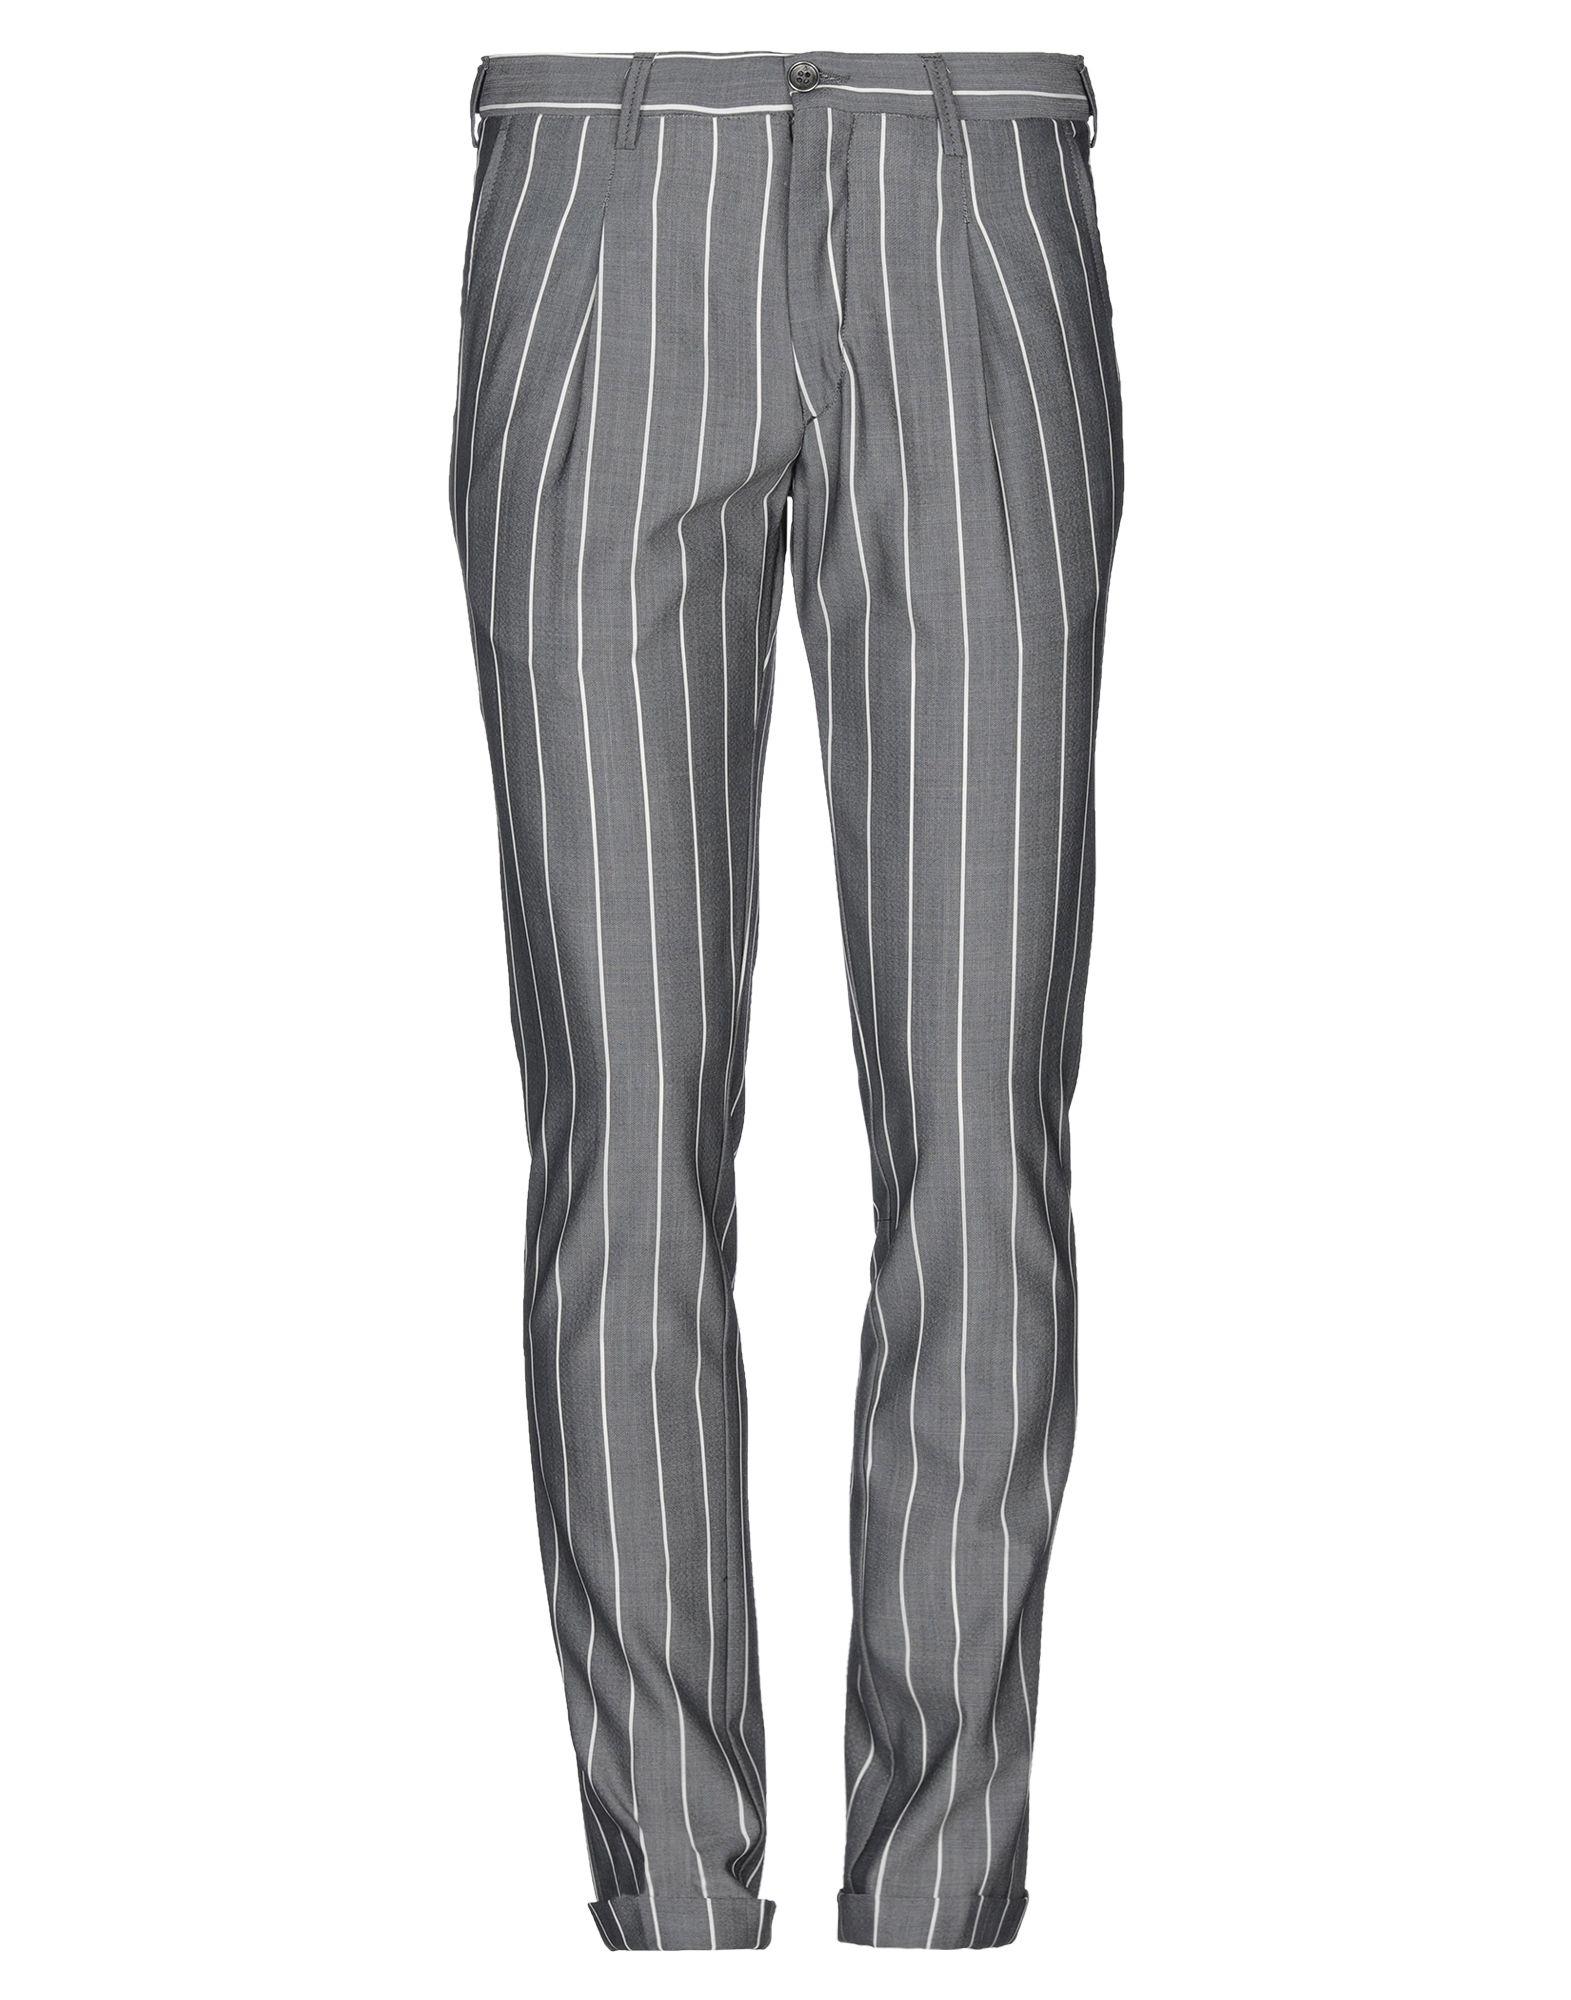 Фото - B SETTECENTO Повседневные брюки settecento new yorker bright white 15x30